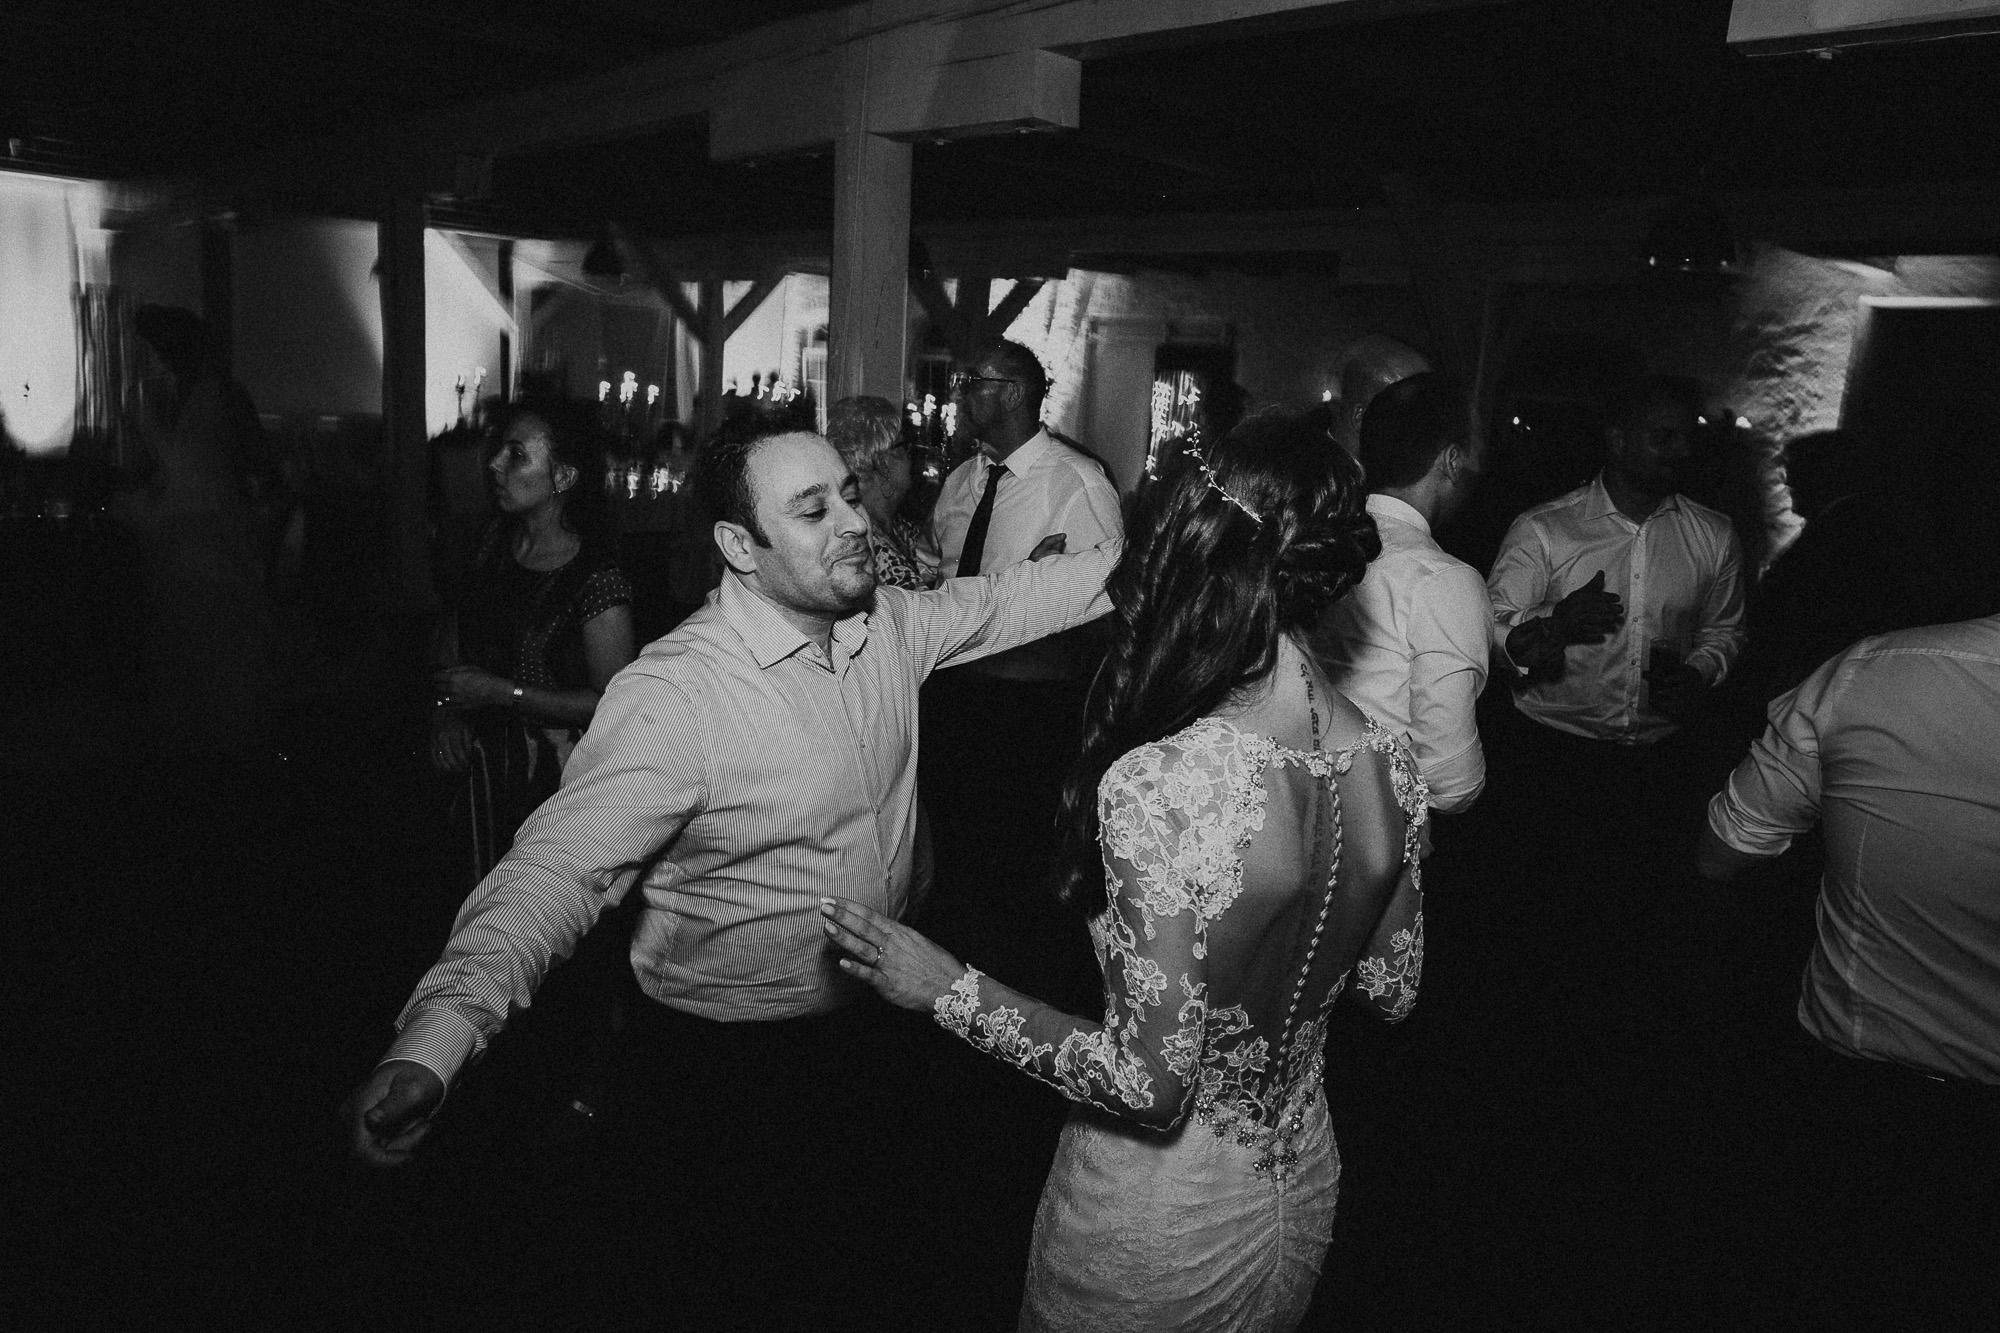 DanielaMarquardtPhotography_Hochzeitsfotograf_Düsseldorf_Köln_Mallorca_Bayern_Austria_Harz_Wedding_AileenundLennart_Weddingphotographer_Ibiza_Tuskany_Italien_Toskana_Portugal_Lissabon282